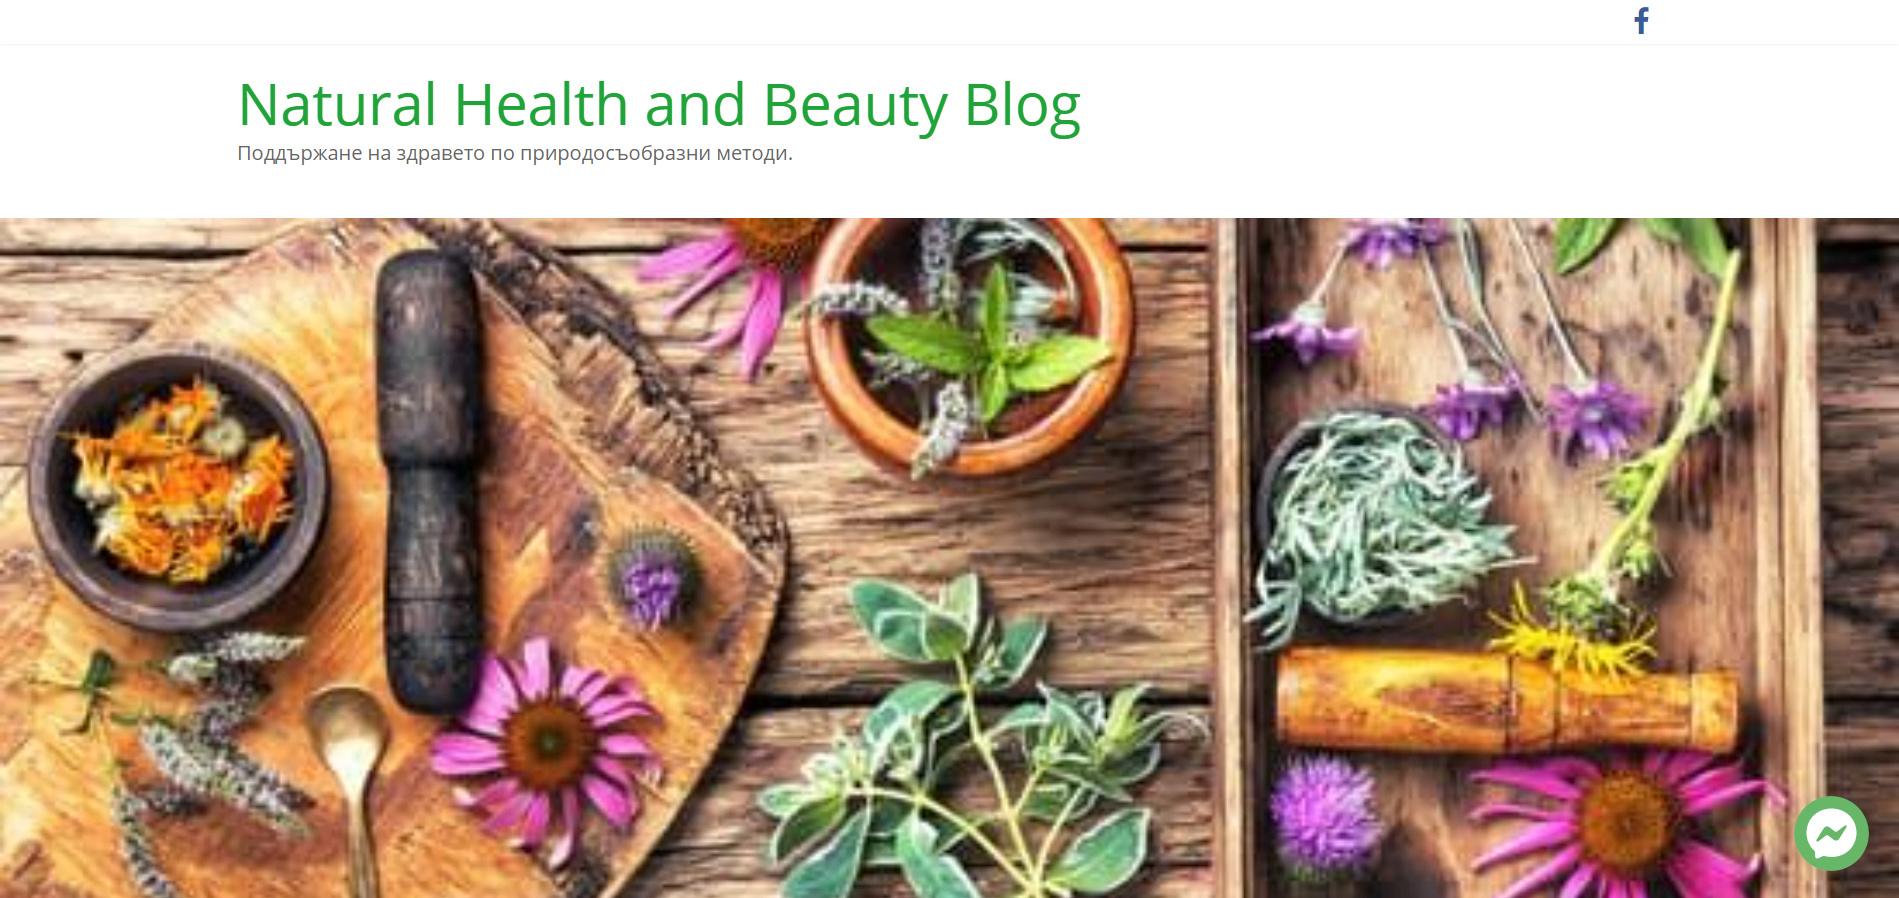 Natural Health and Beauty Blog